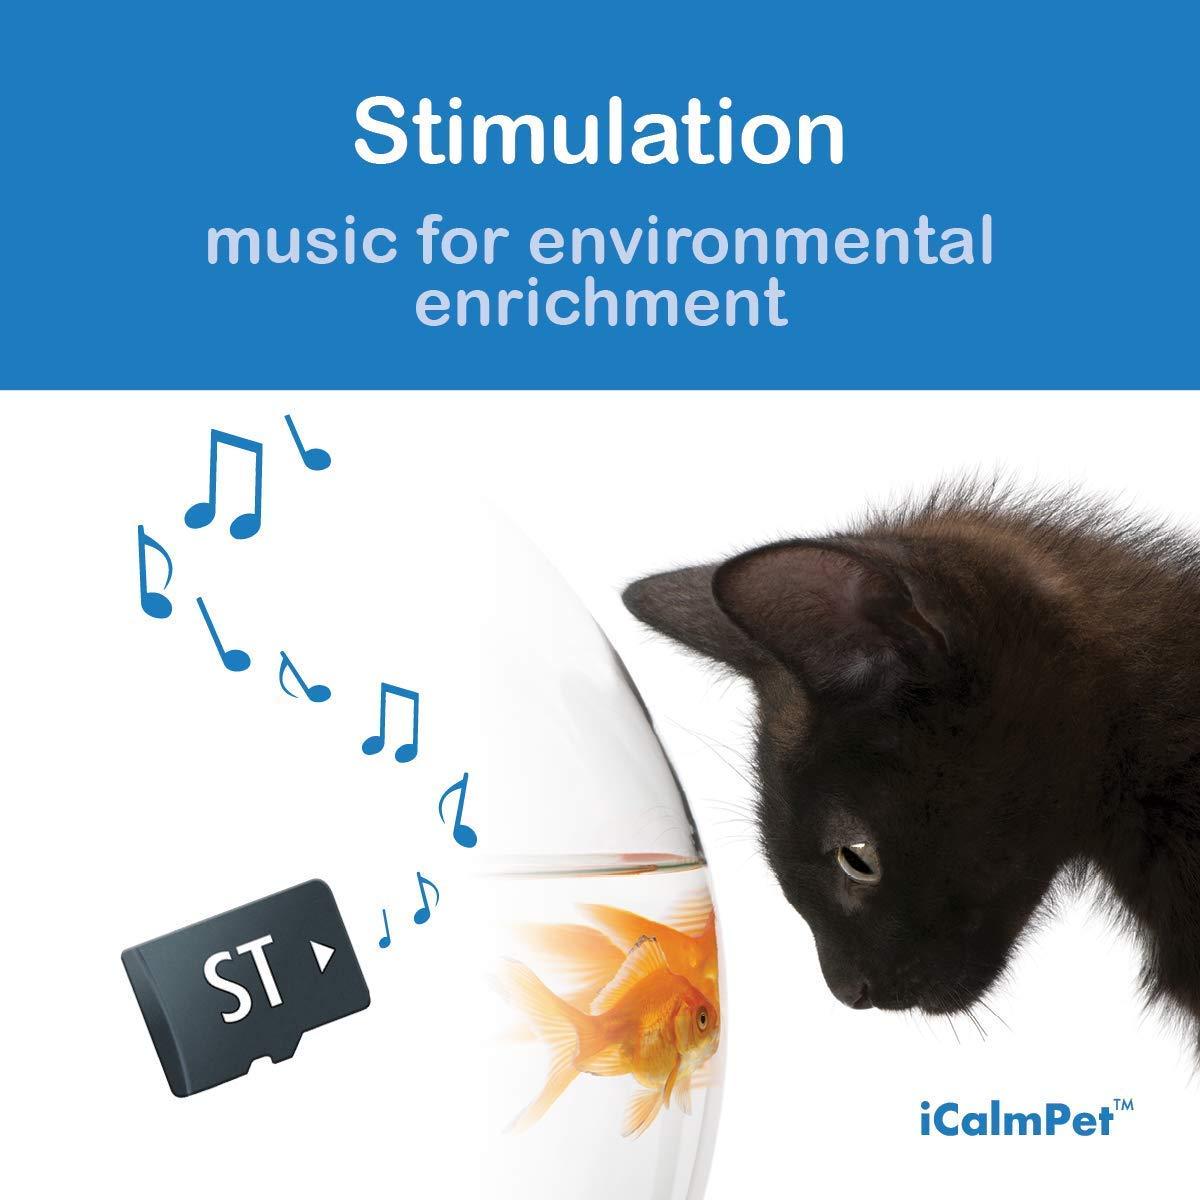 iCalmCat Music for Cat Stimulation (SD Card for iCalmCat Speaker) Image